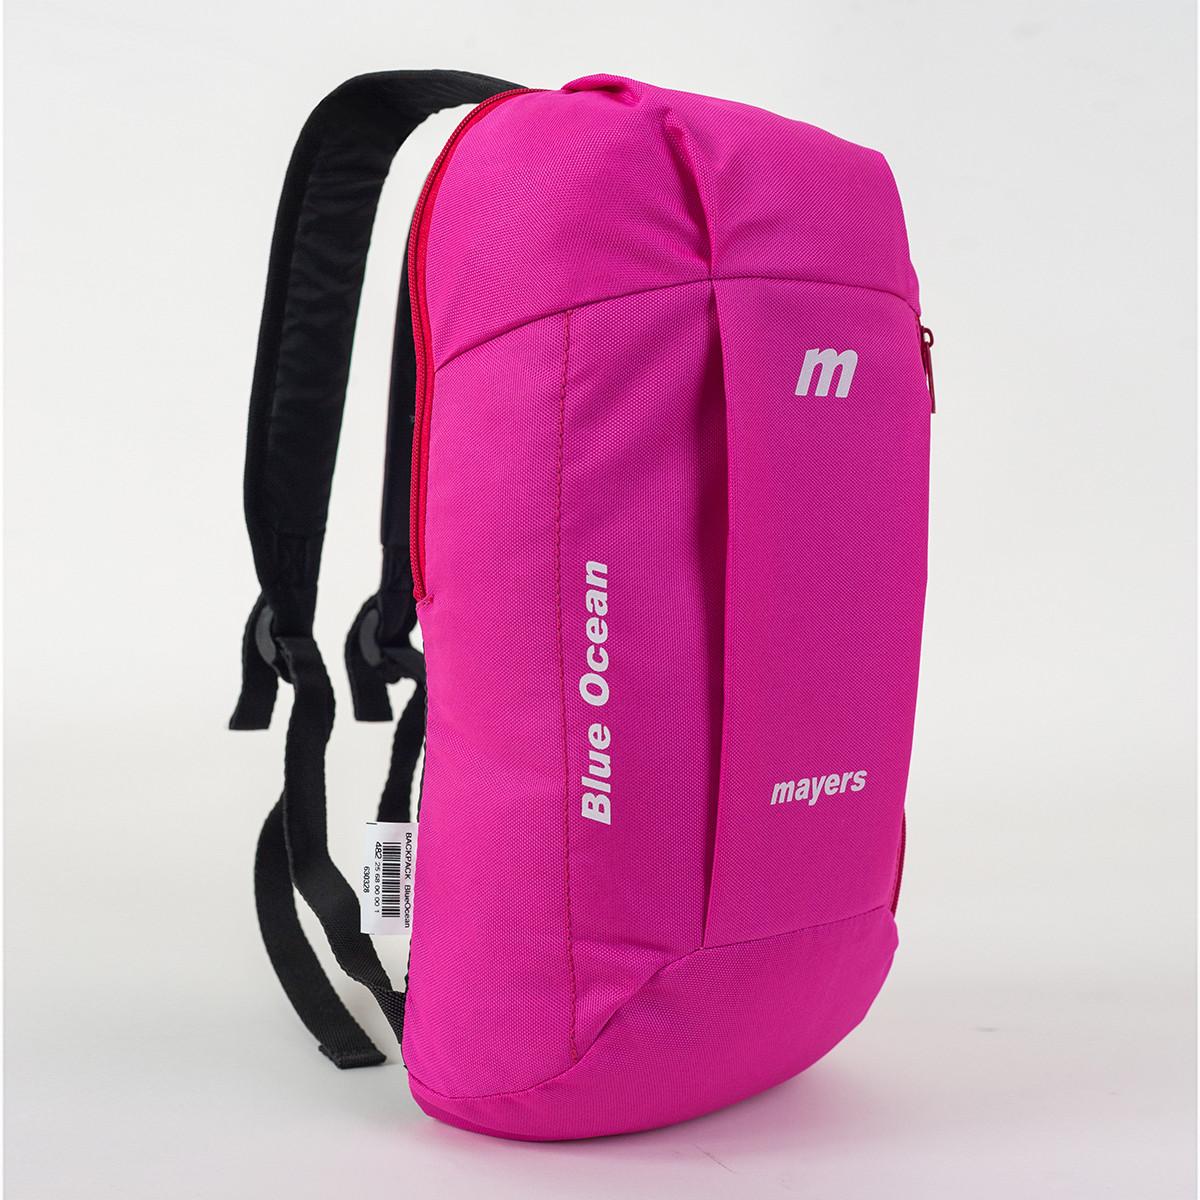 Спортивный рюкзак MAYERS 10L, розовый, фото 2